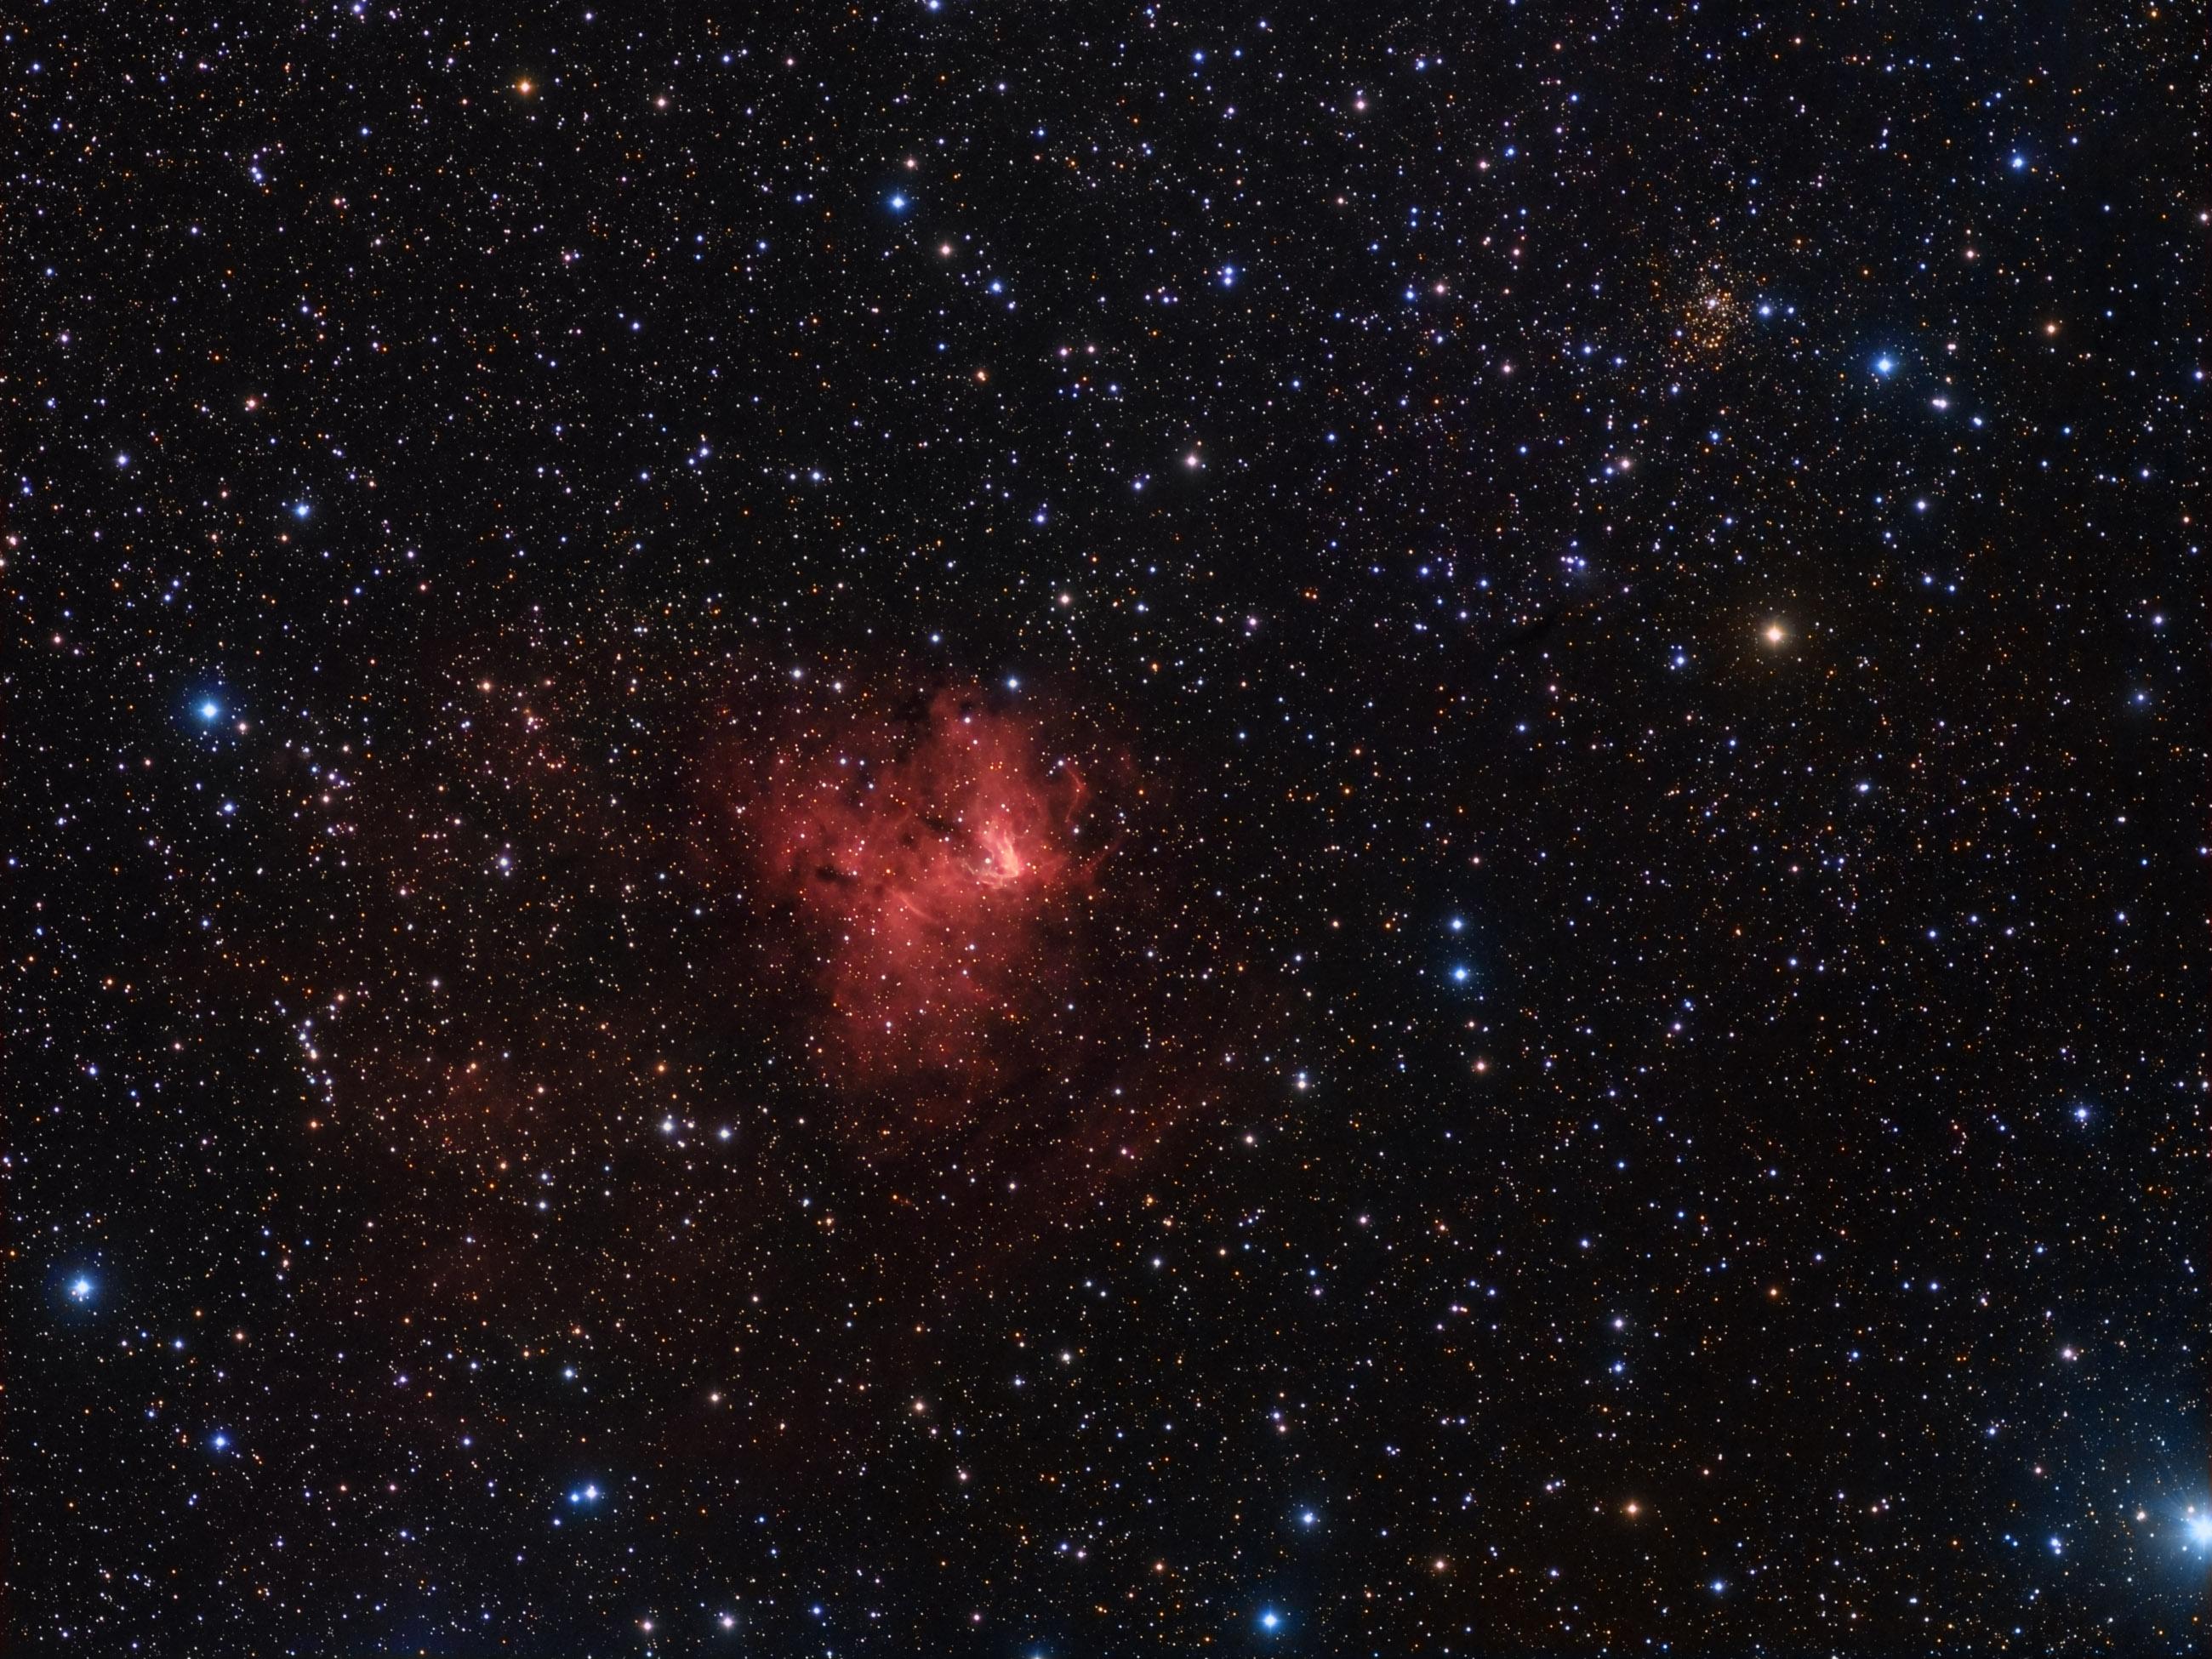 NGC 2174 Nebula wallpaper - Space wallpapers - #8092